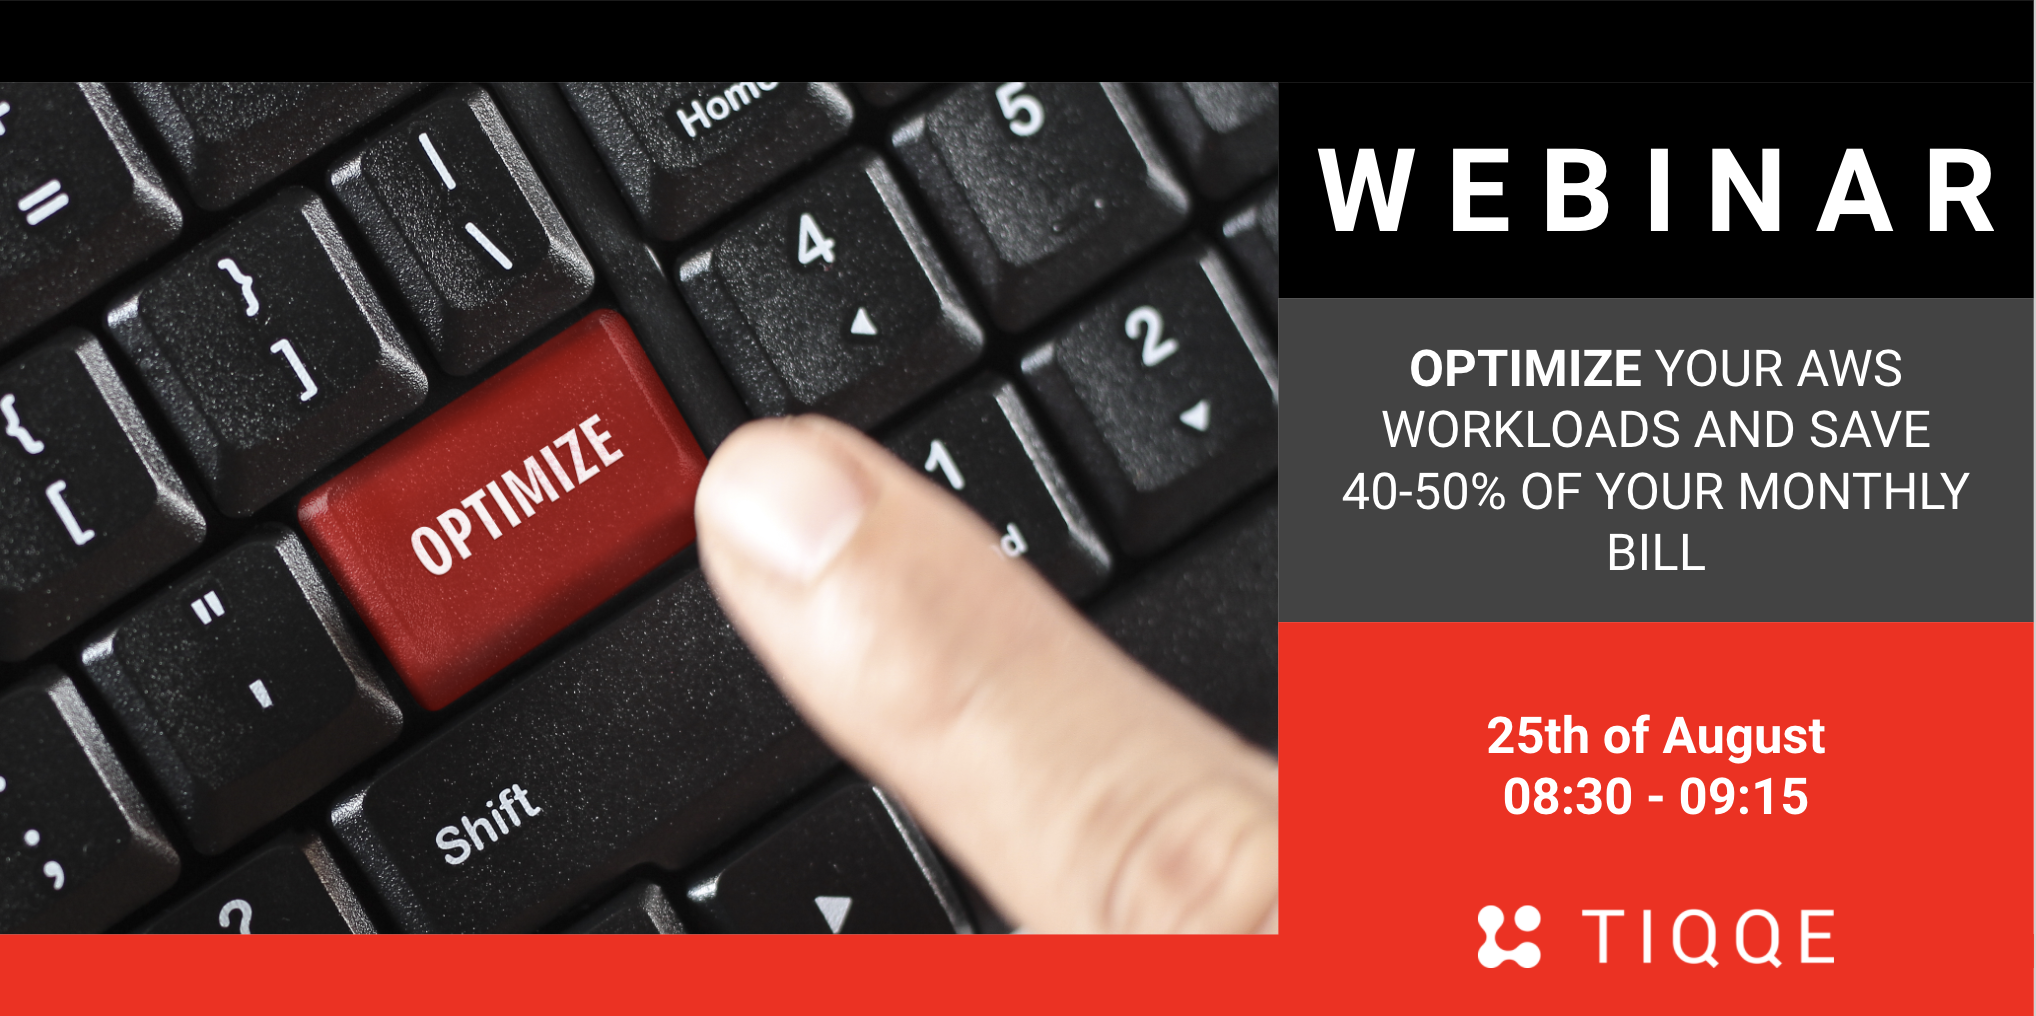 Cloud optimization webinar